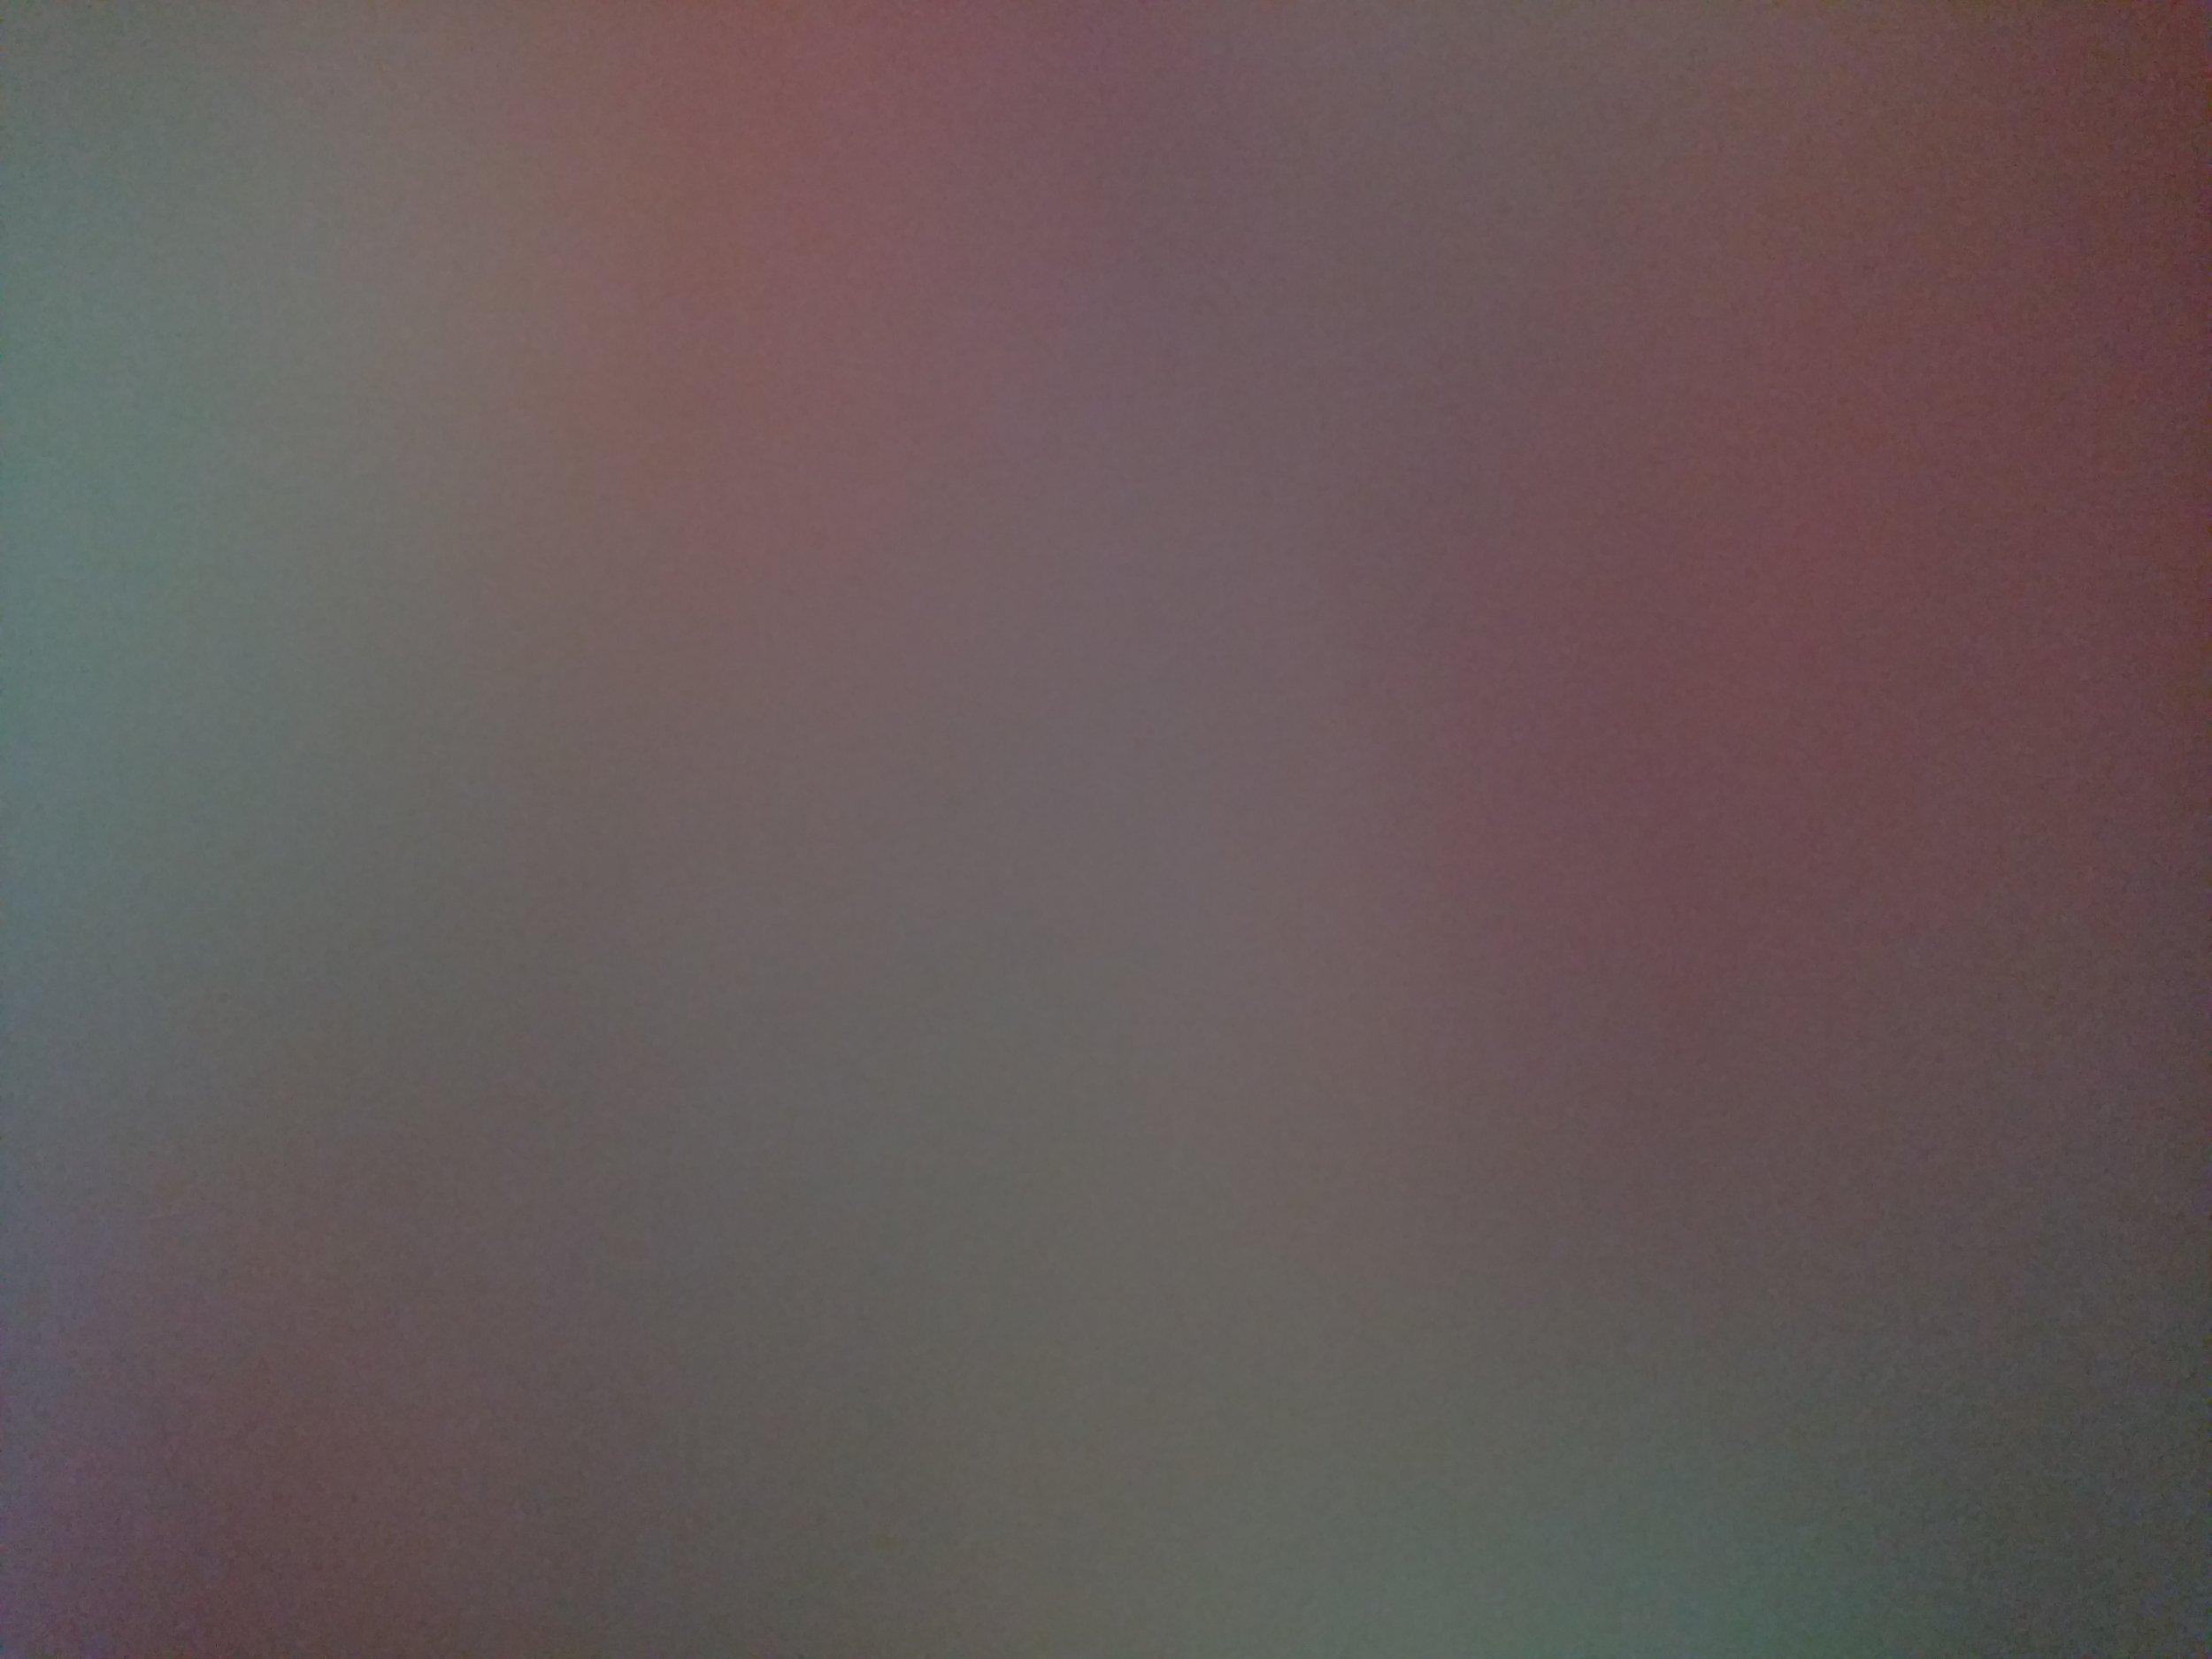 willroth-co-free-texture-gradient-079.jpg